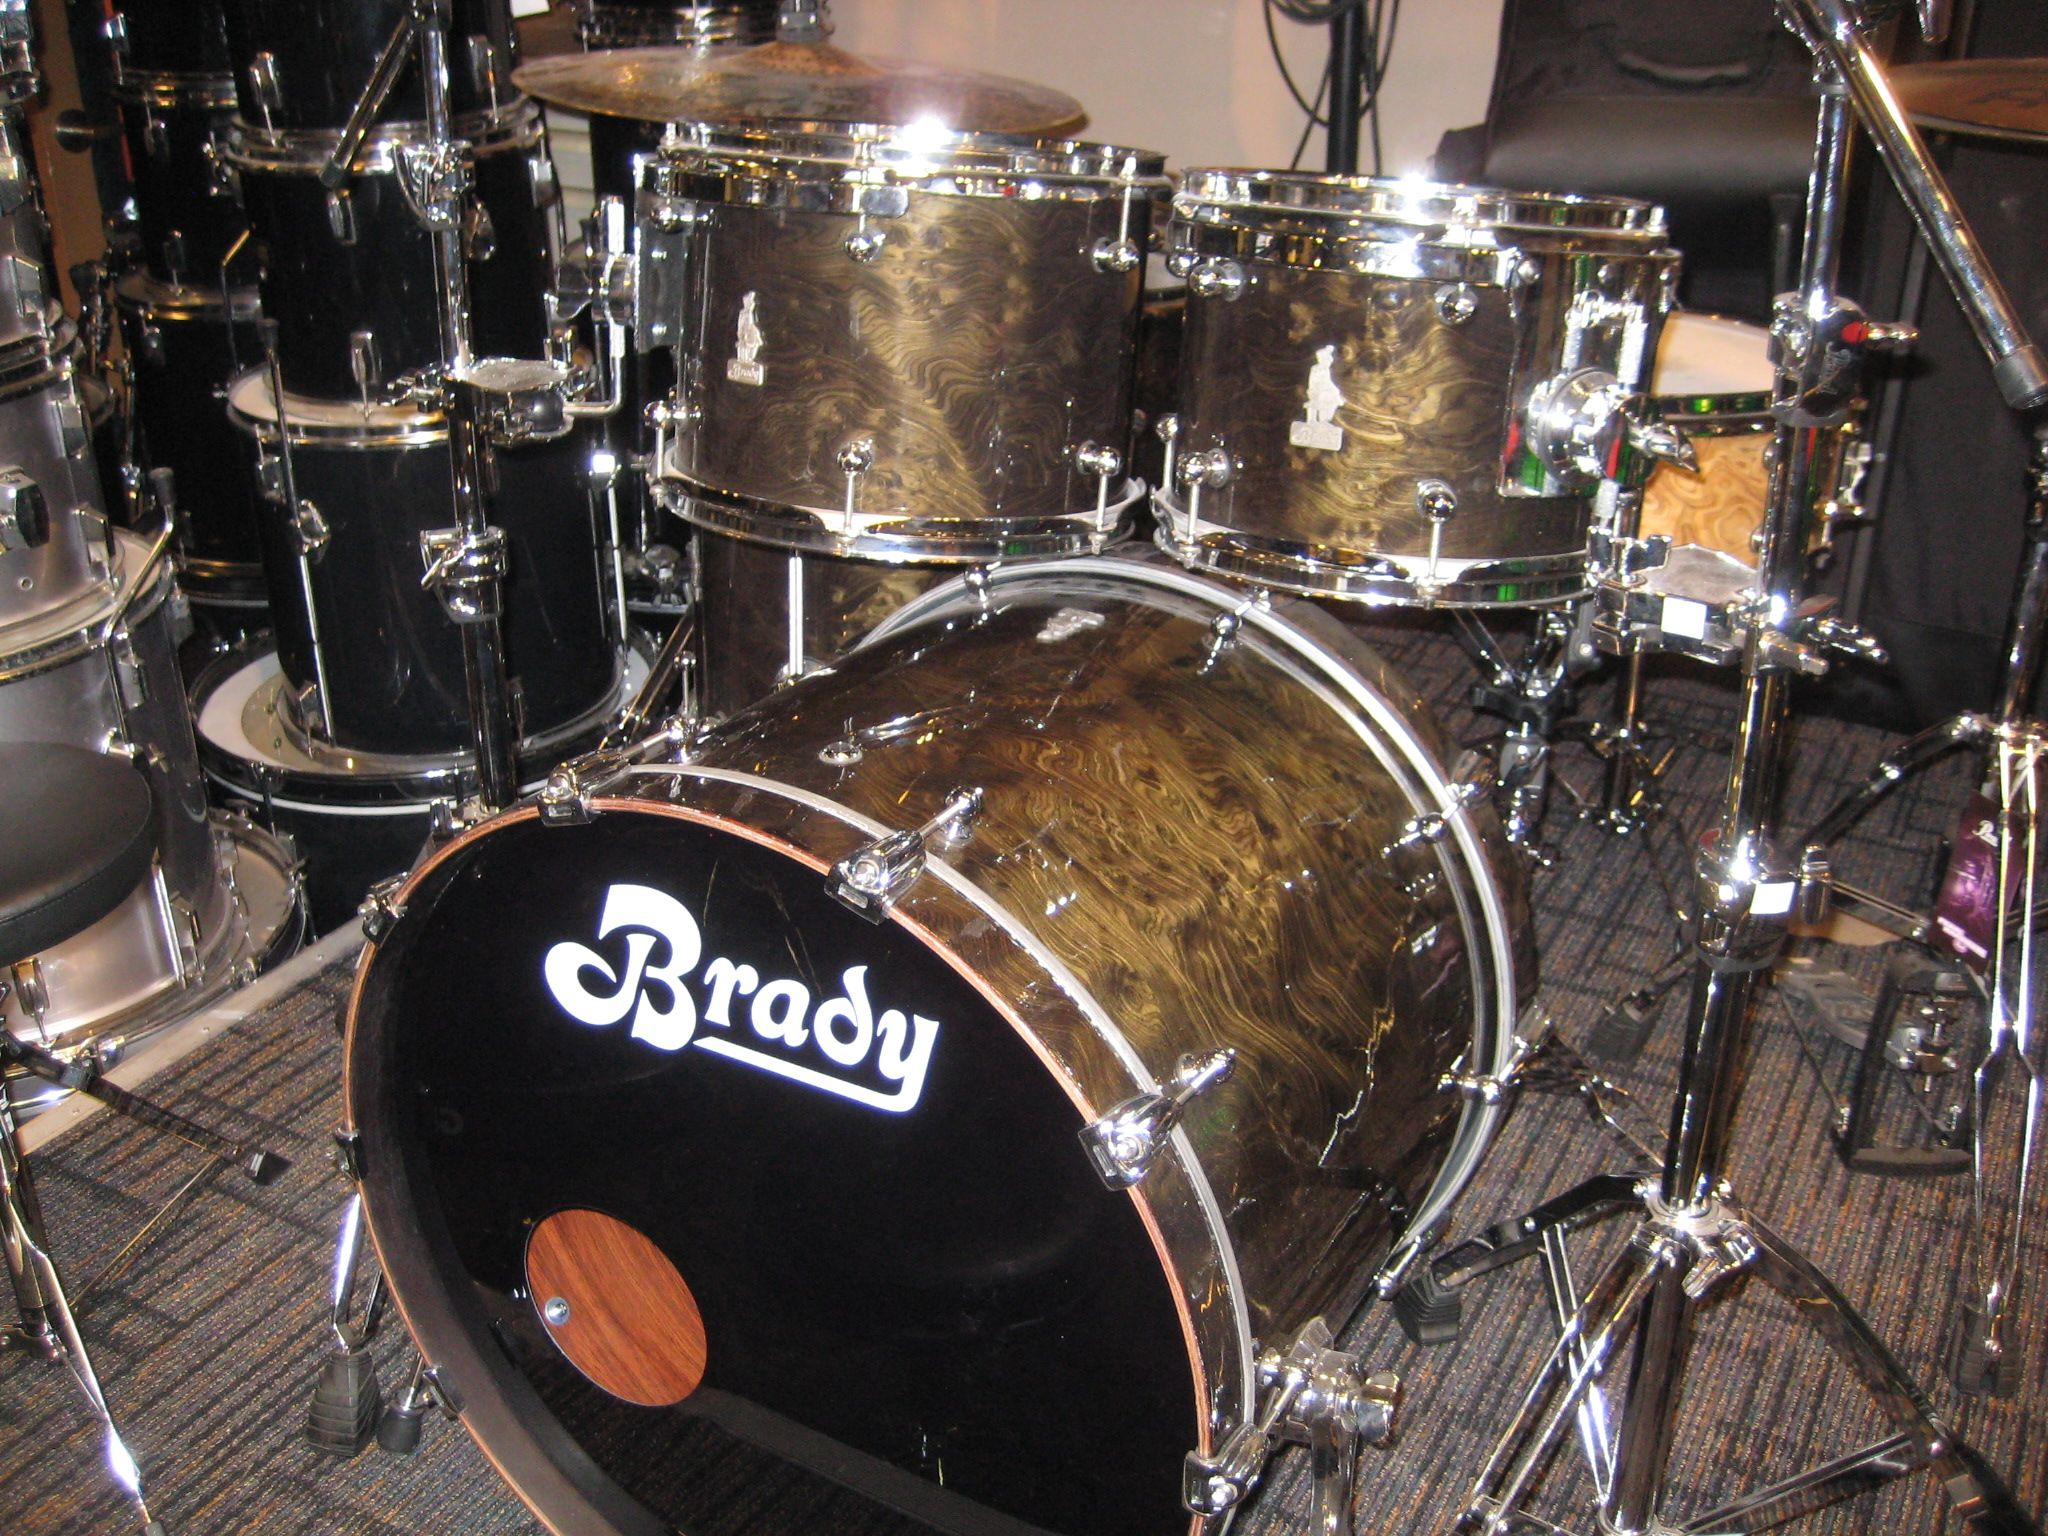 Brady Jarrah Ply Halls Creek Gloss Drum Kit At Just Drums In Toronto Canada Drum Kits Drums Drummer